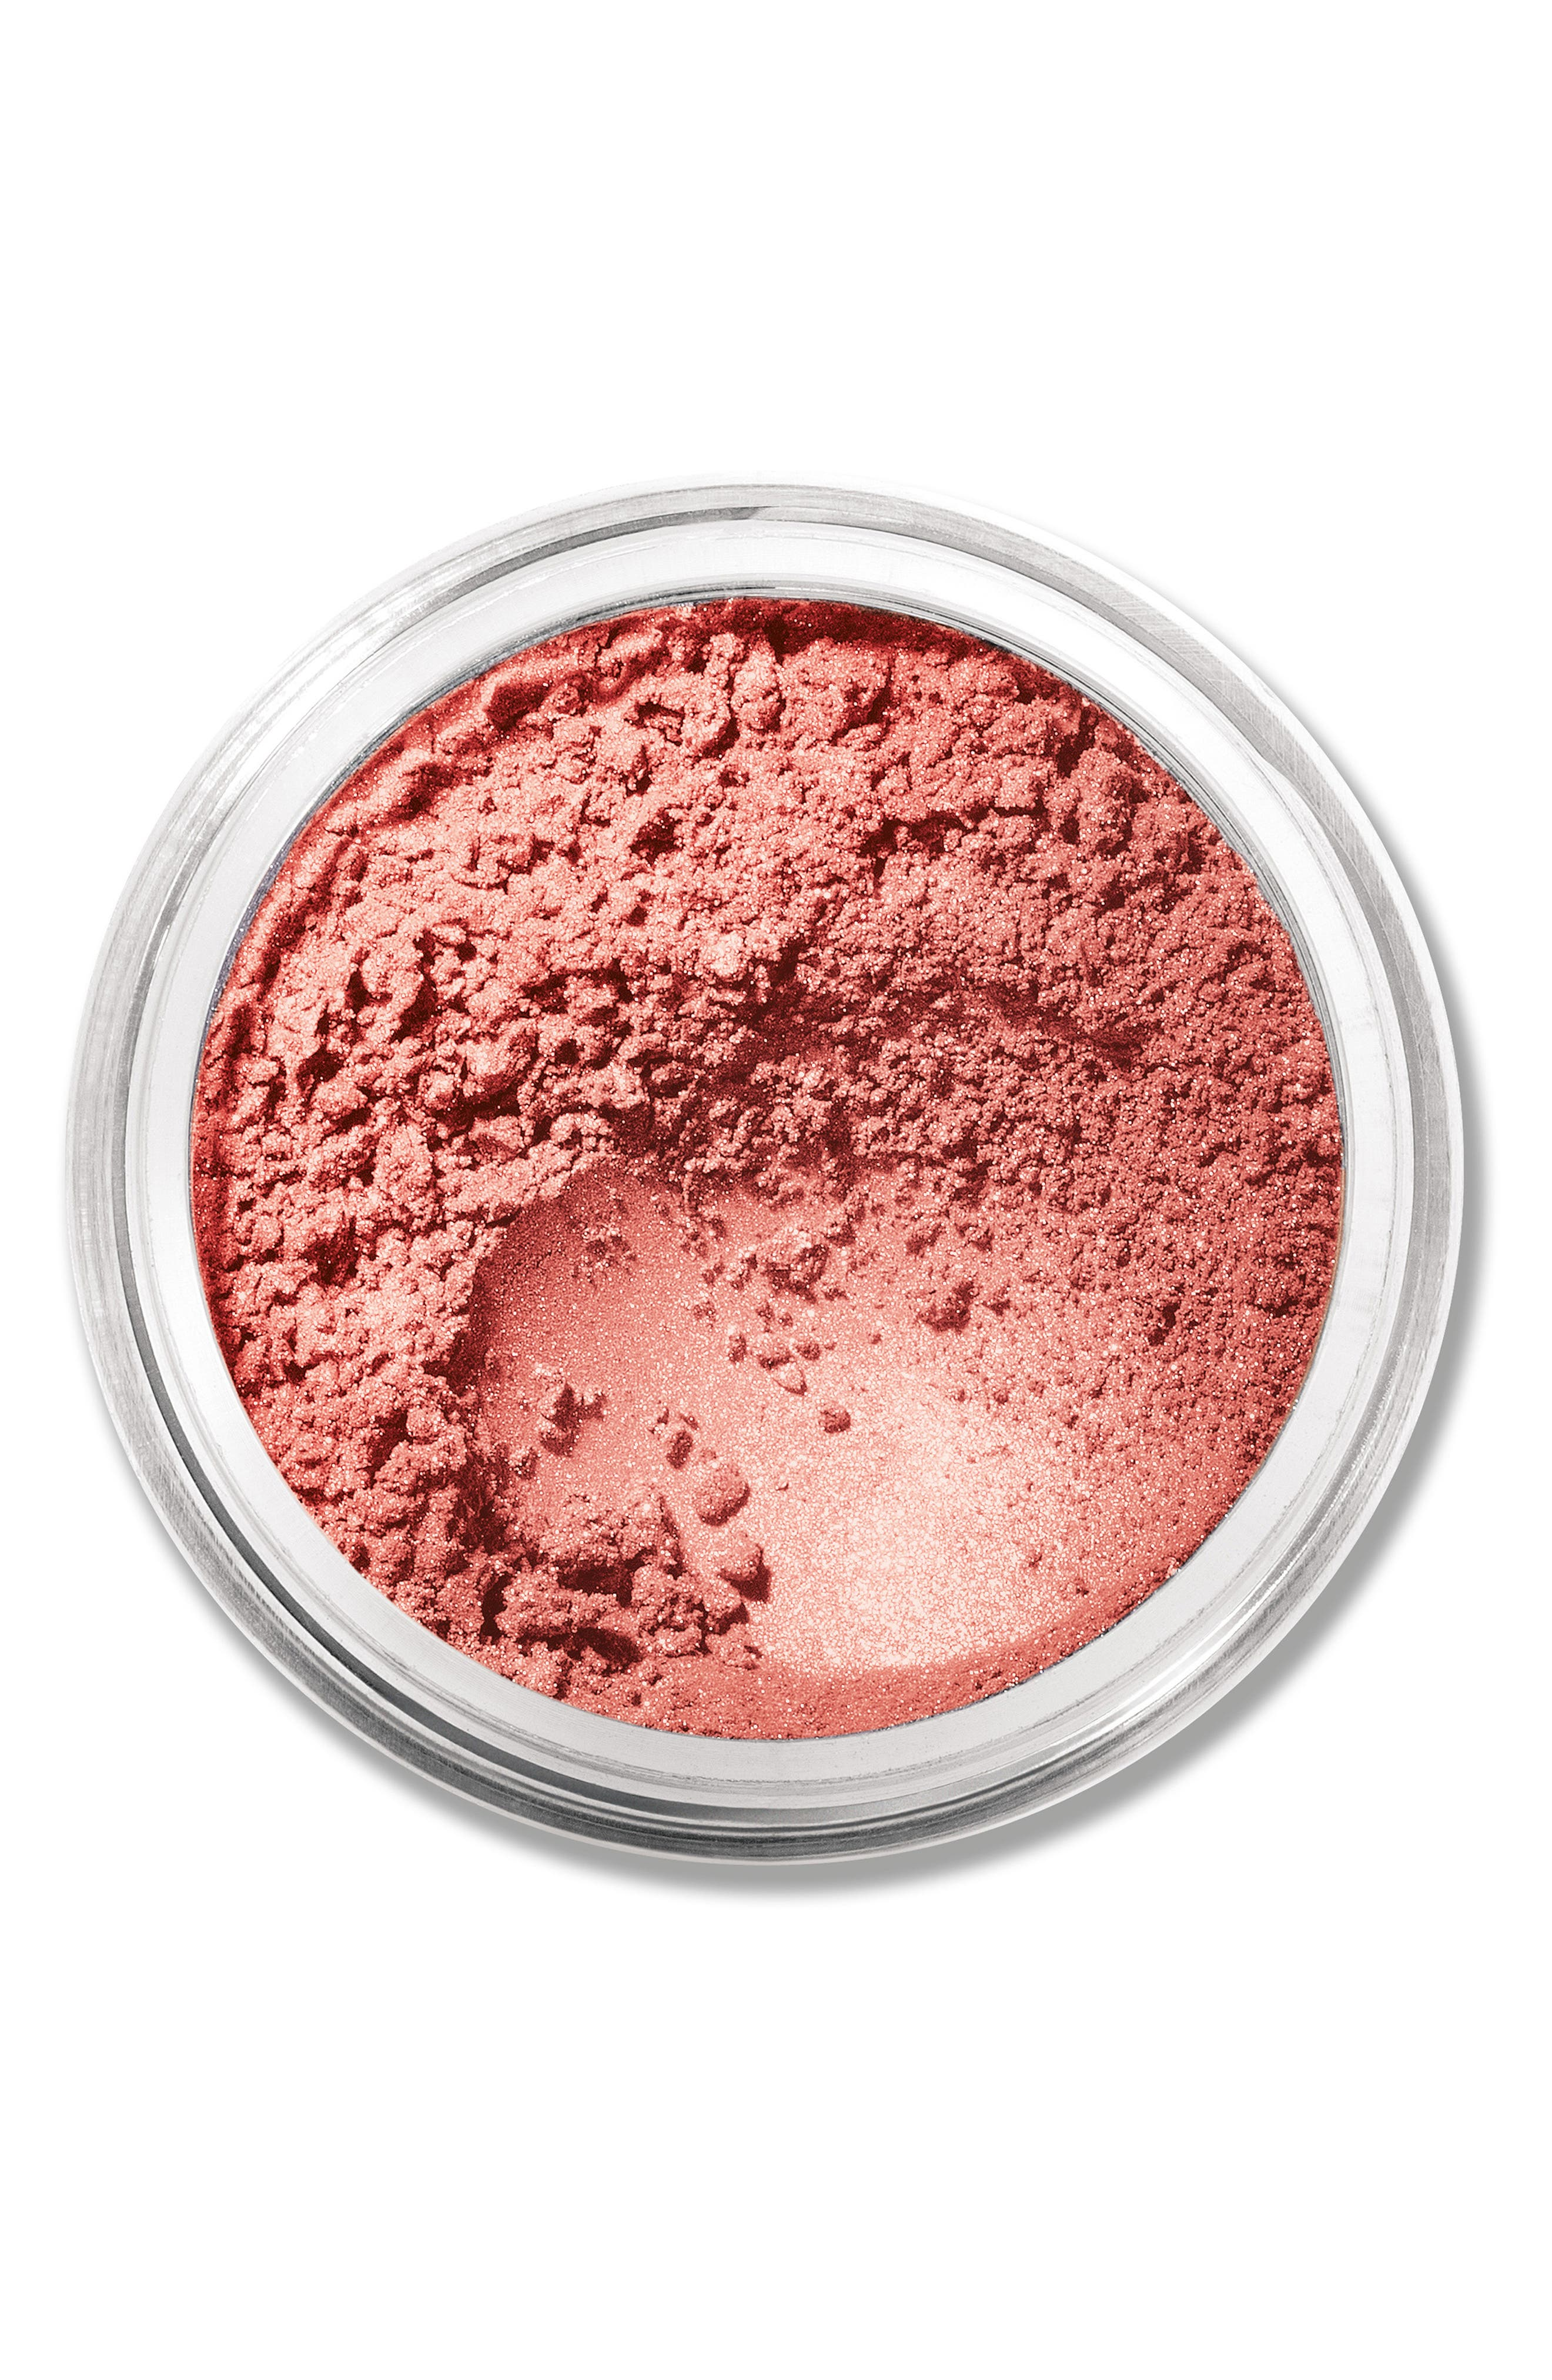 Bareminerals Powder Blush